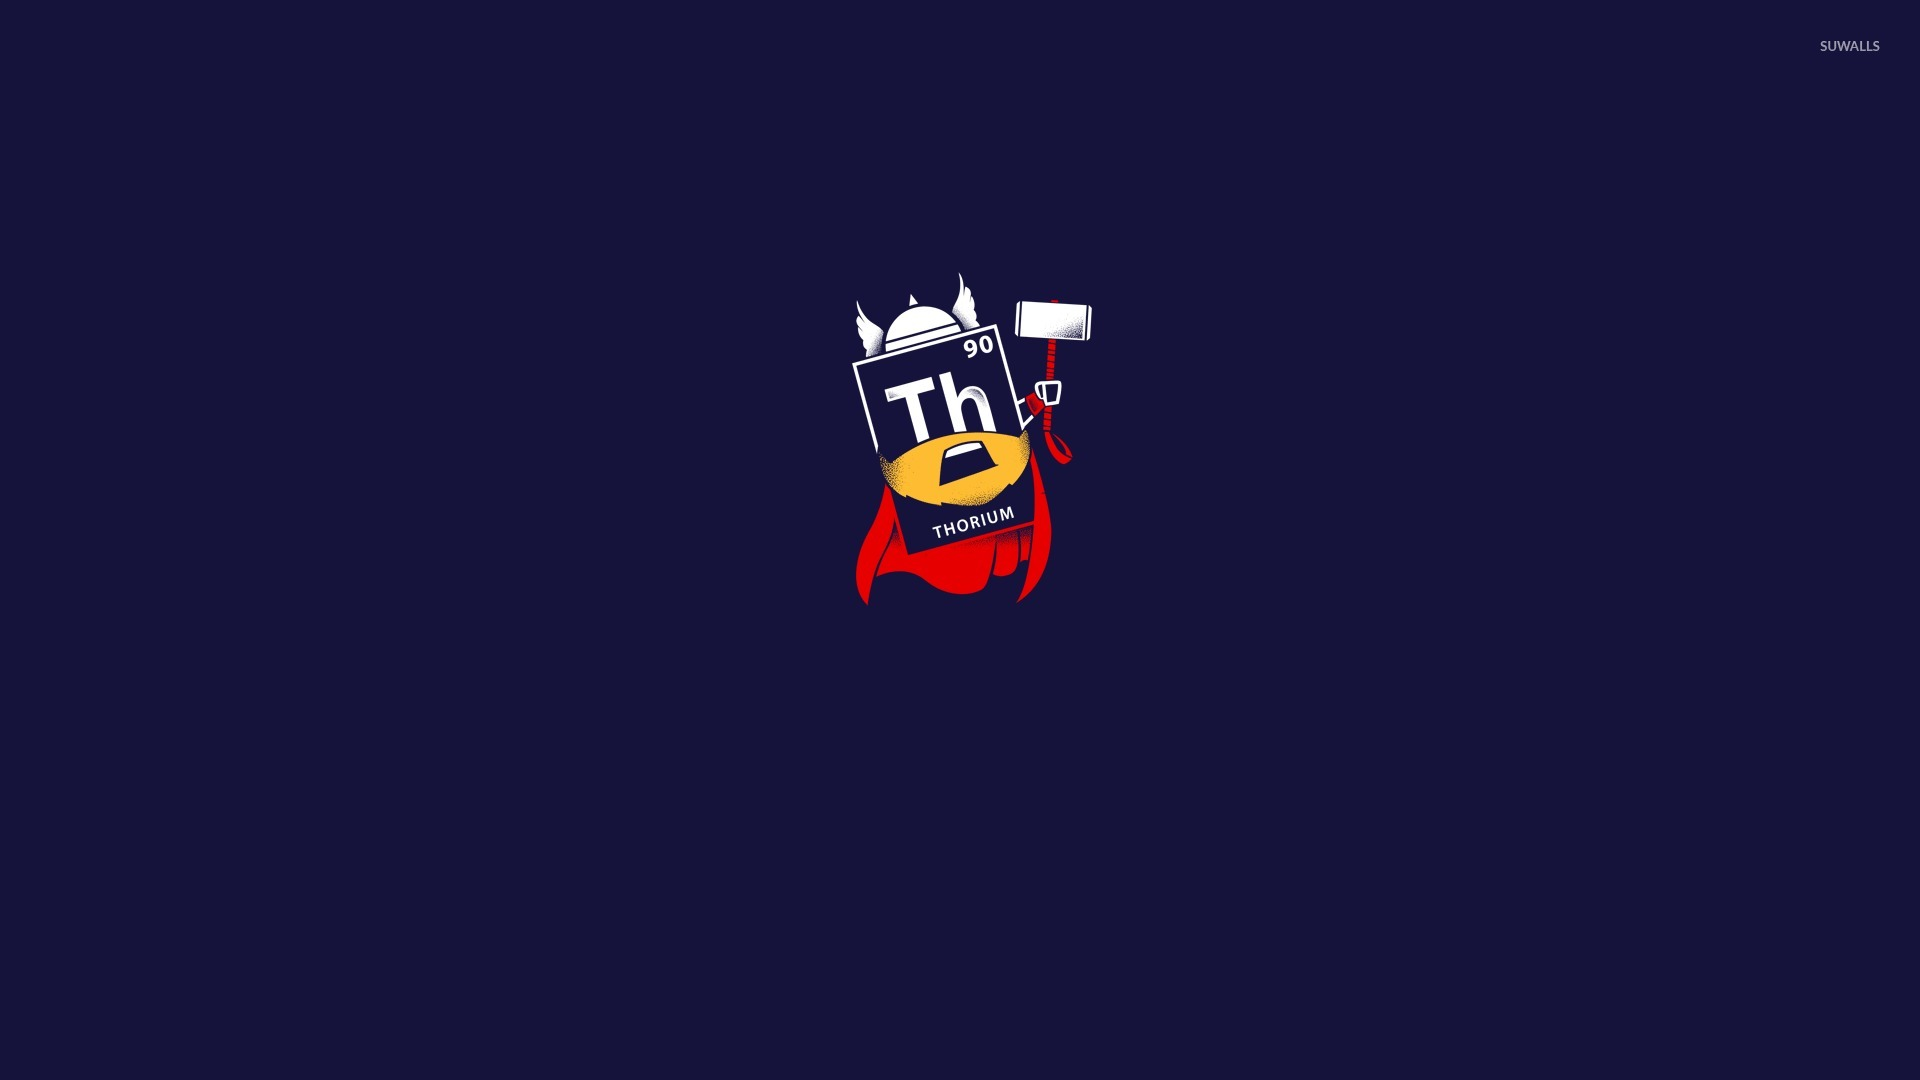 Cute Cartoon Bird Wallpapers Thorium As Thor Wallpaper Funny Wallpapers 50043